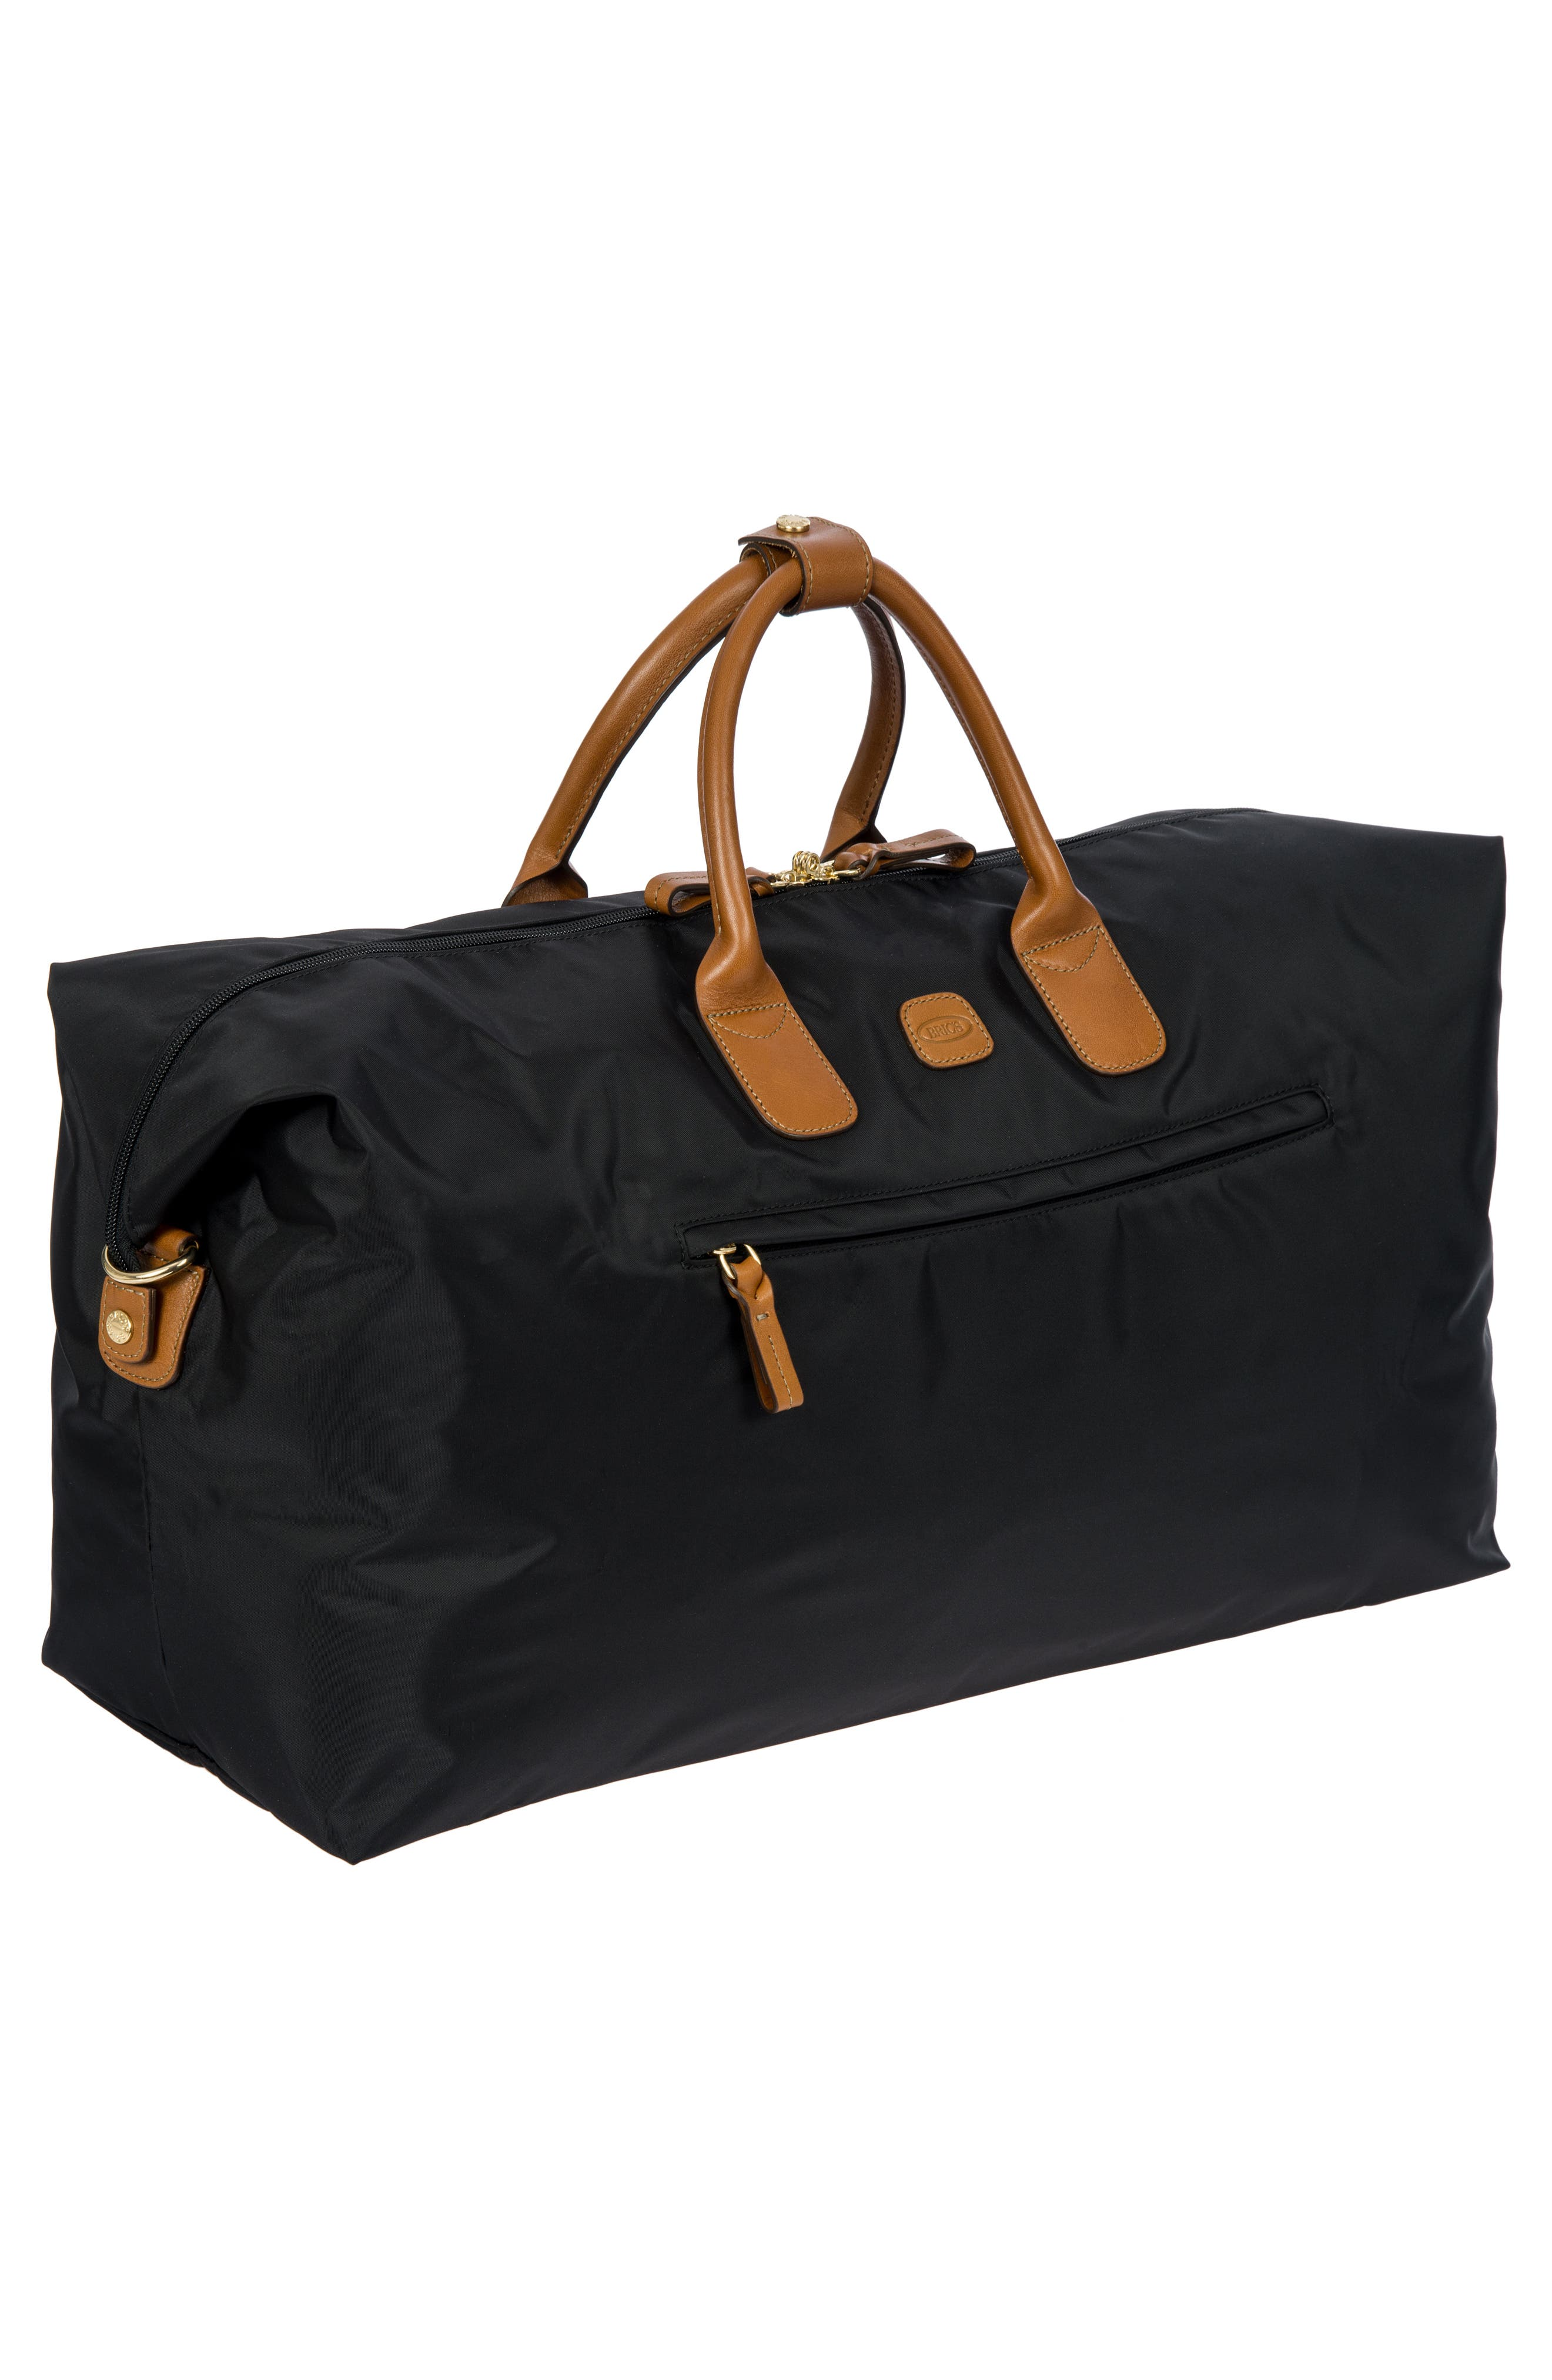 X-Bag Boarding 22-Inch Duffel Bag,                             Alternate thumbnail 4, color,                             BLACK